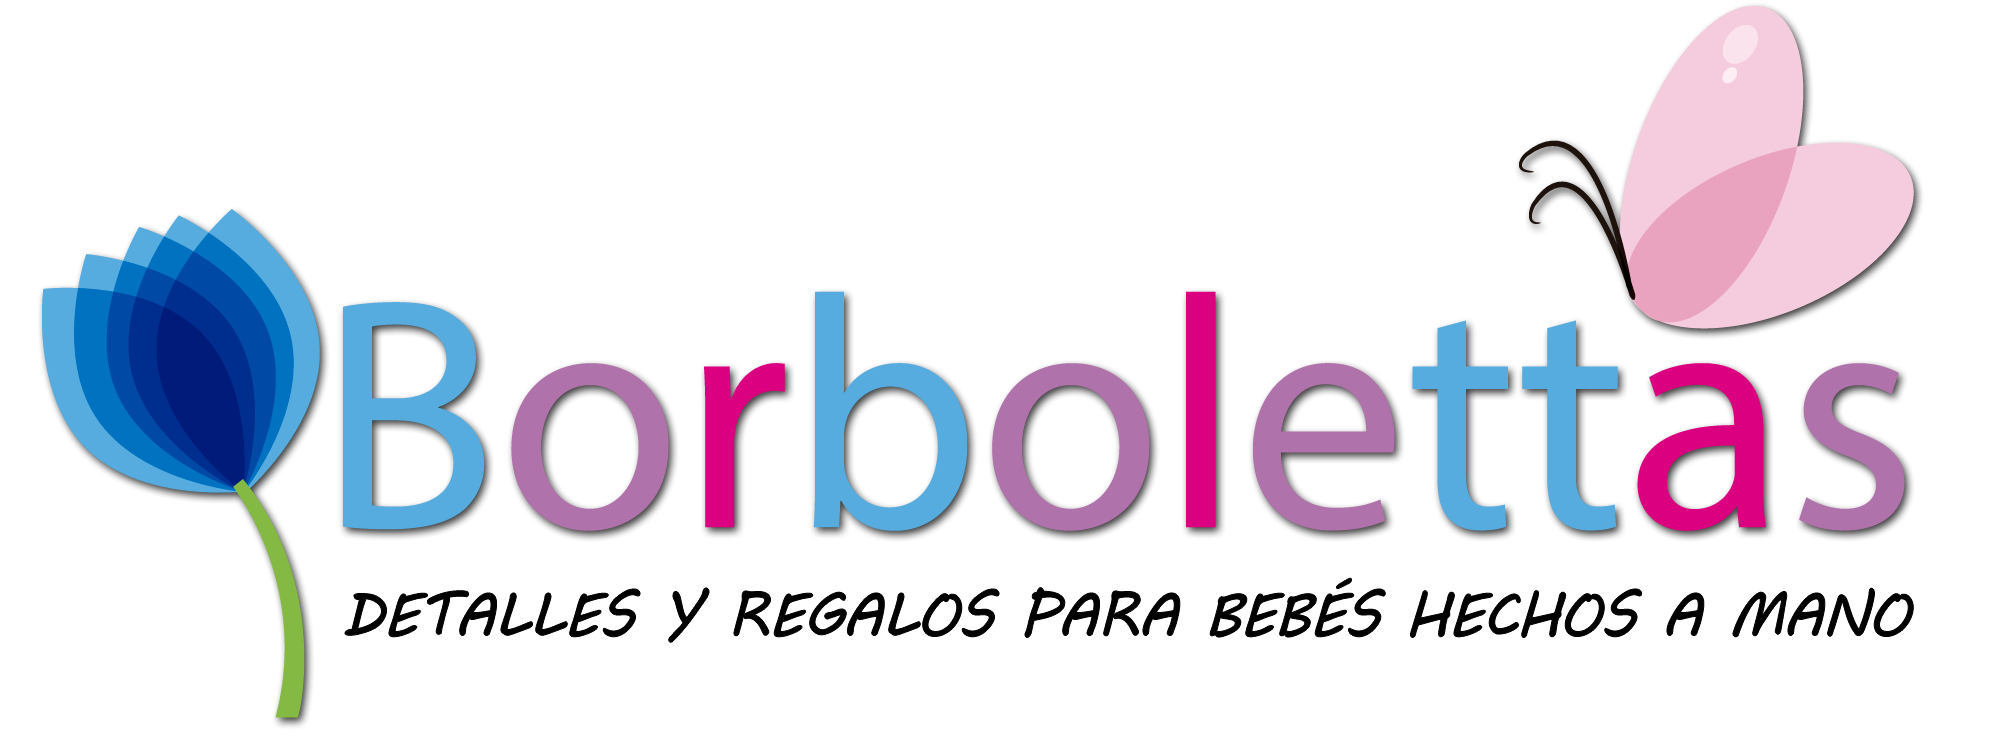 Borbolettas